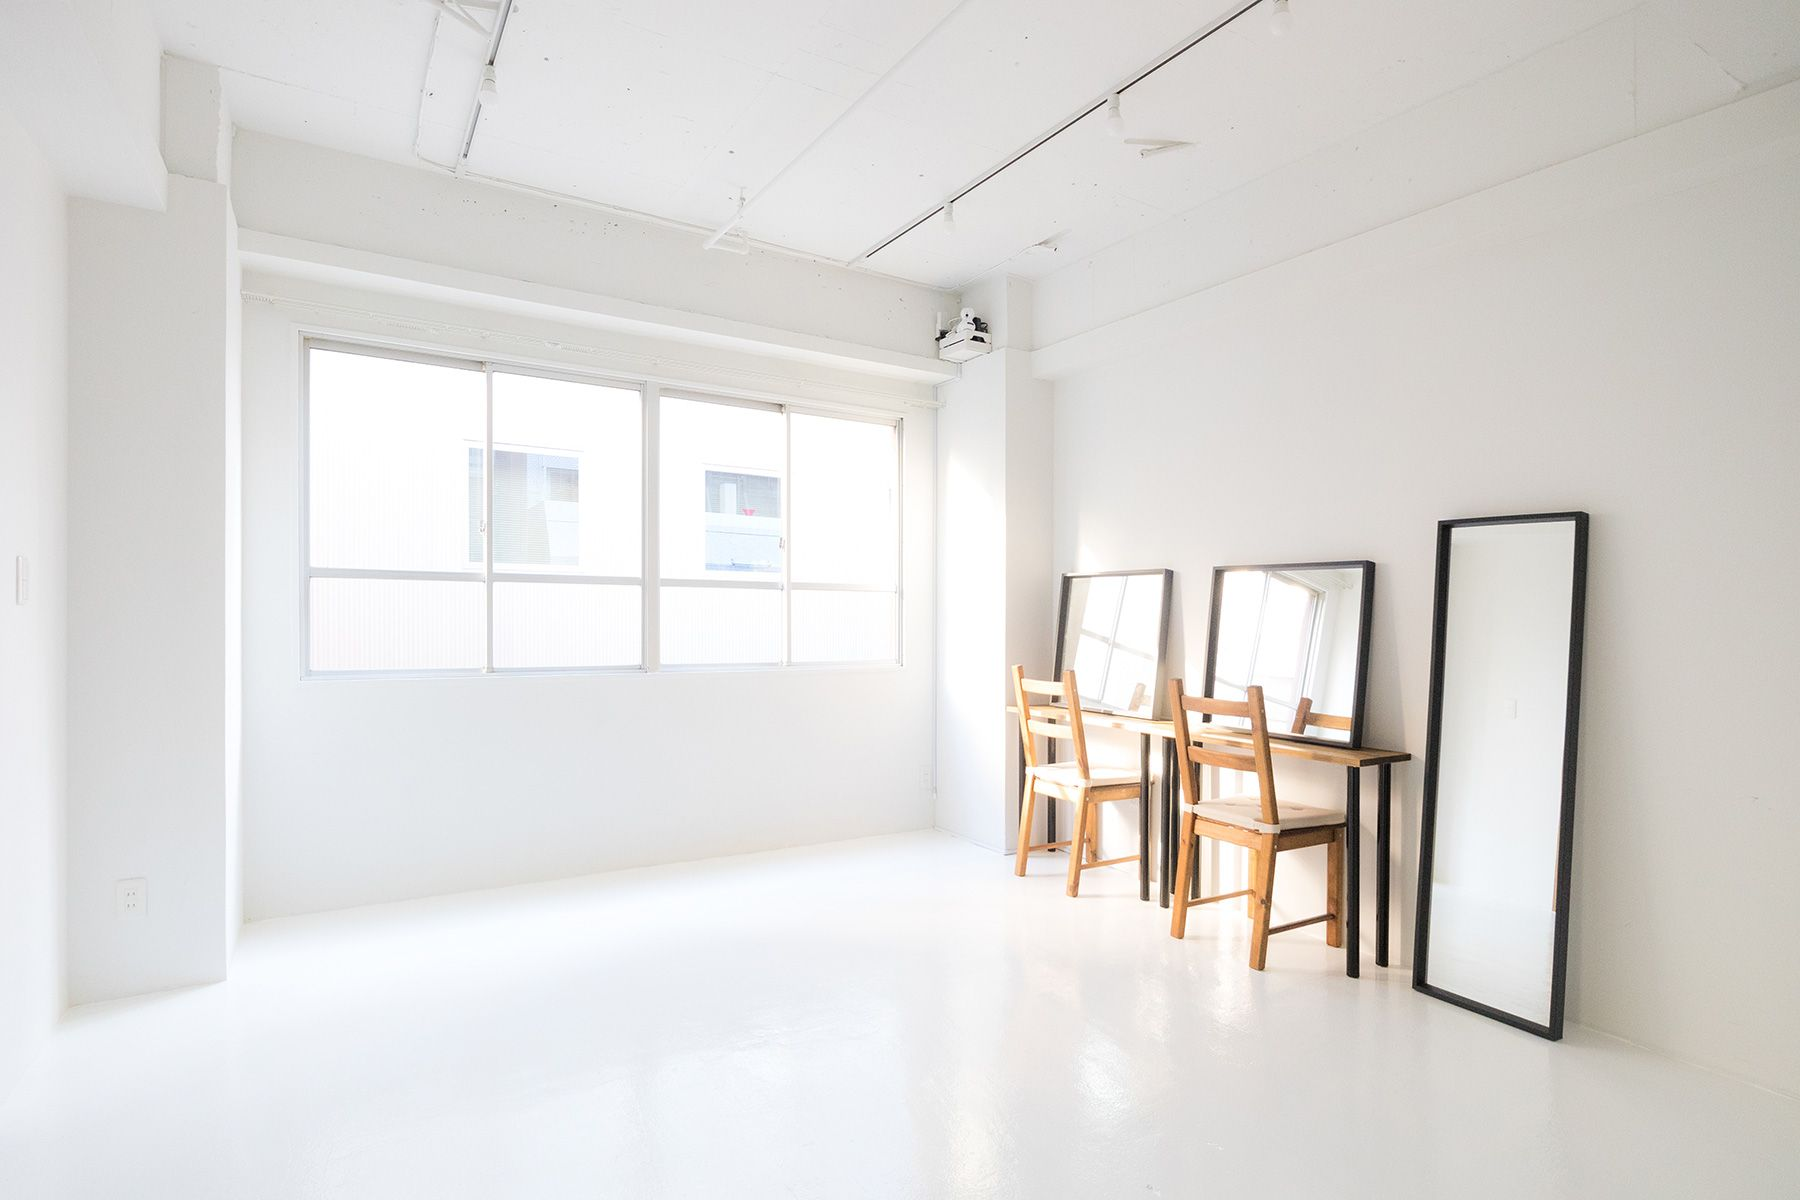 Studio Serato 水道橋 (スタジオセラート水道橋)窓側は柔らかい自然光